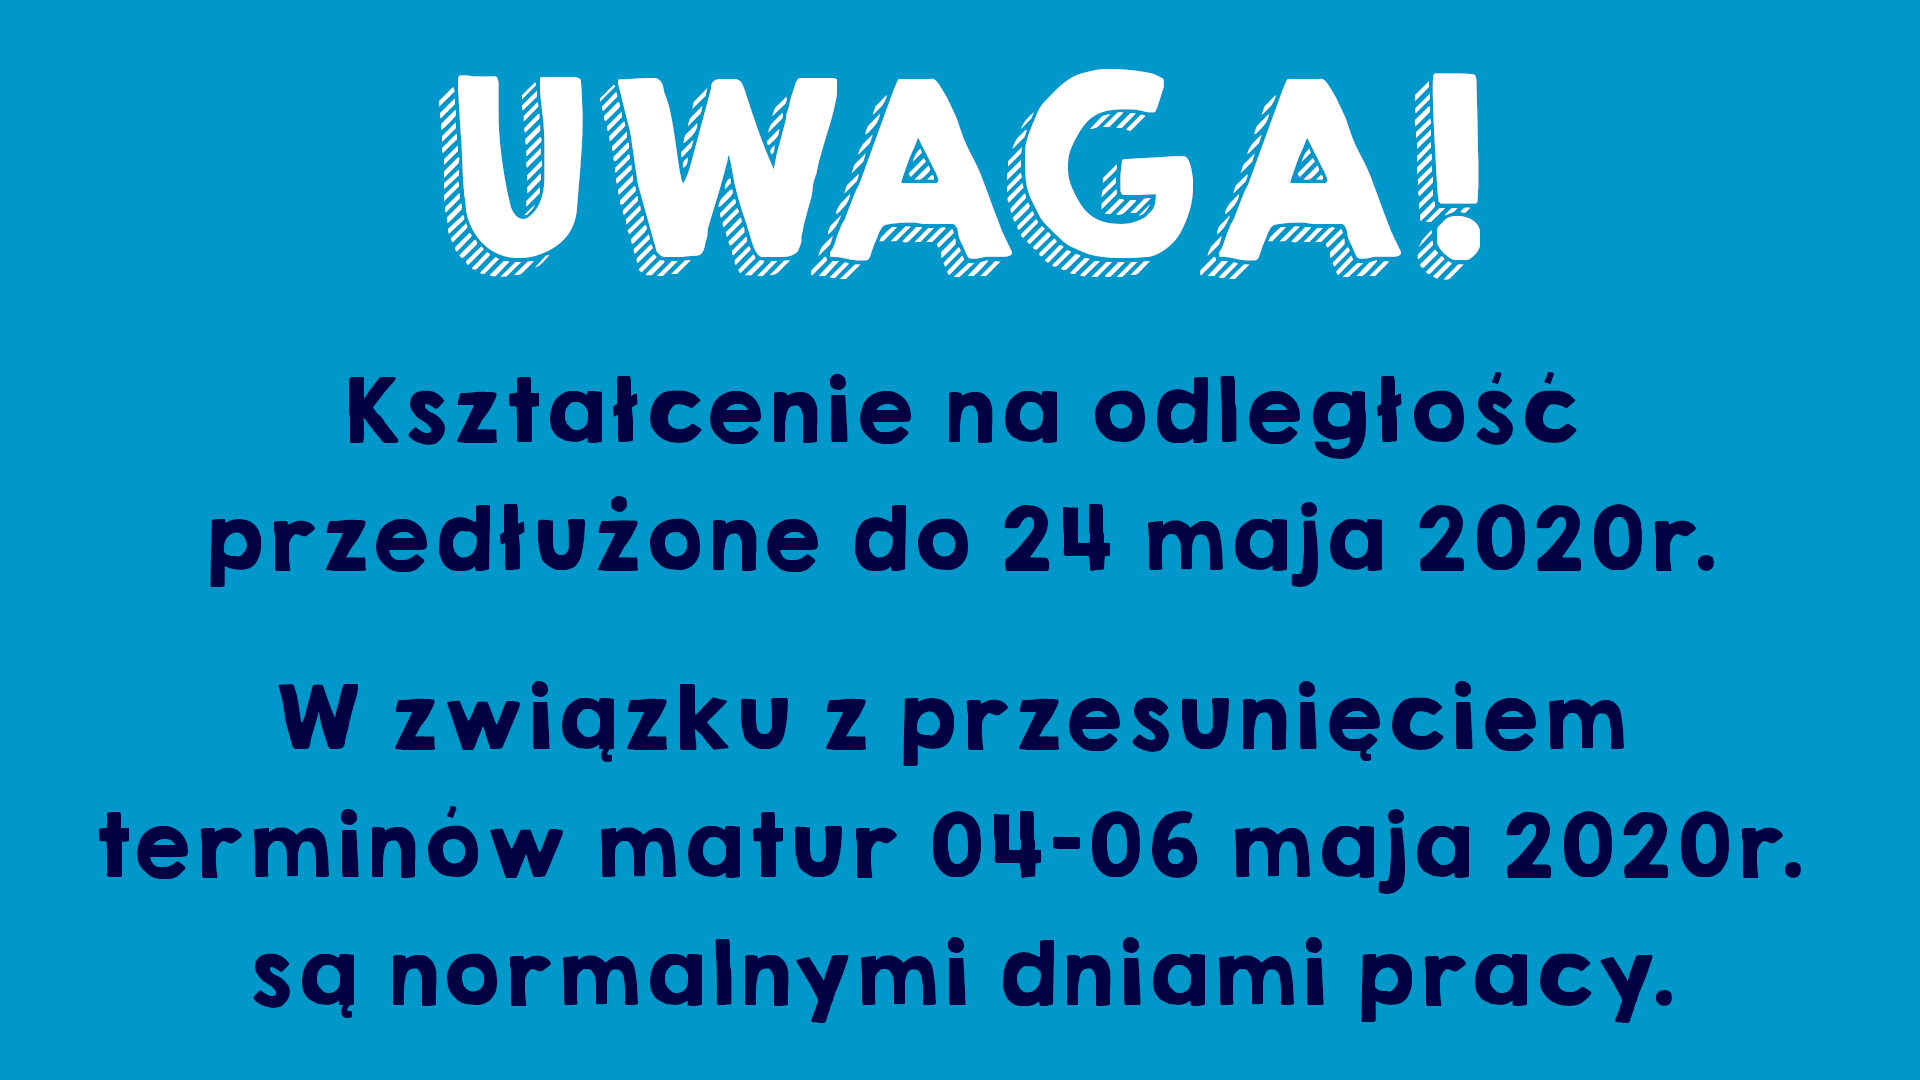 UWAGA6